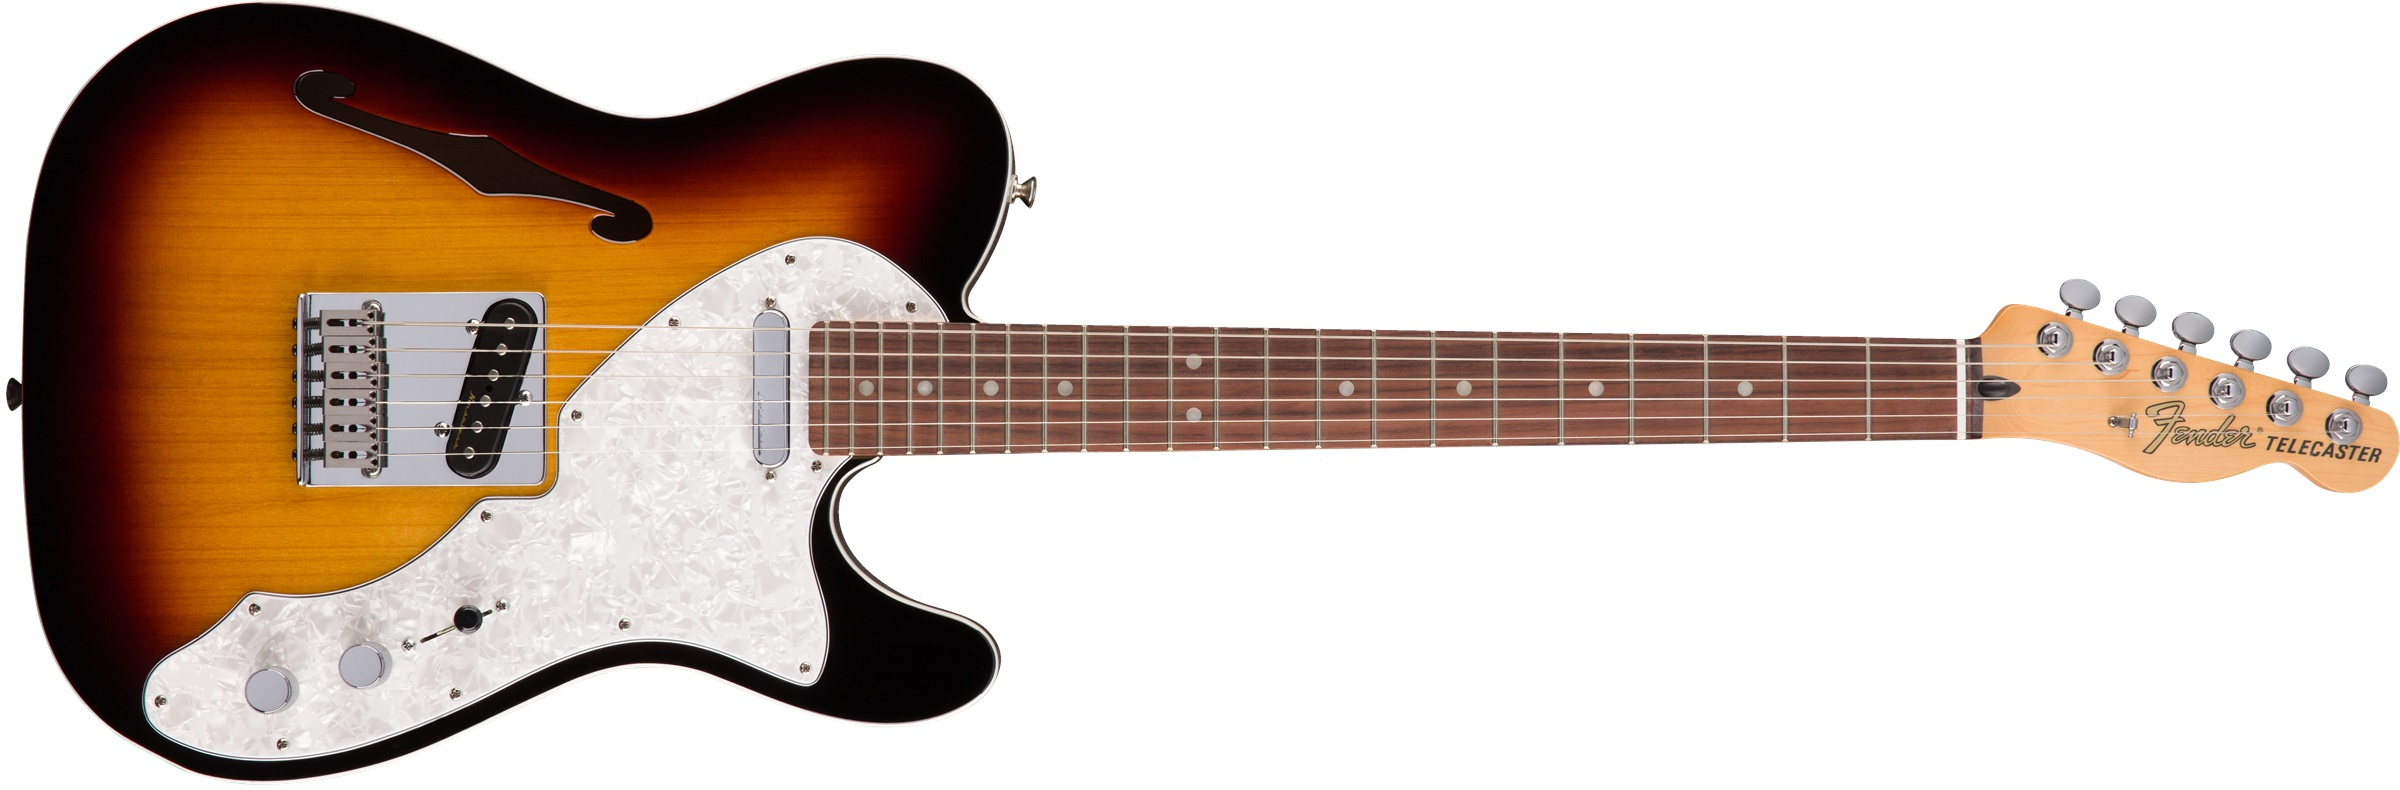 Fender Deluxe Telecaster Thinline RW 3TSB